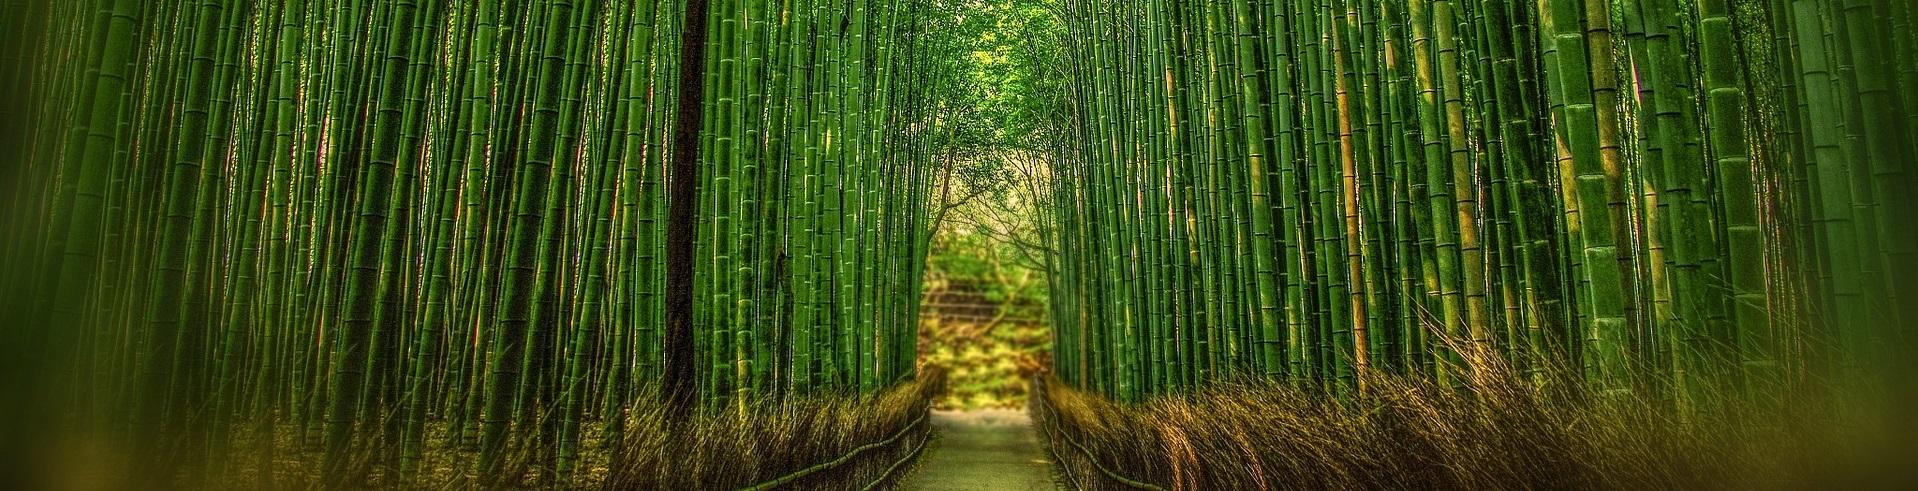 bambus tapete viele motive gr en bambus freunde. Black Bedroom Furniture Sets. Home Design Ideas